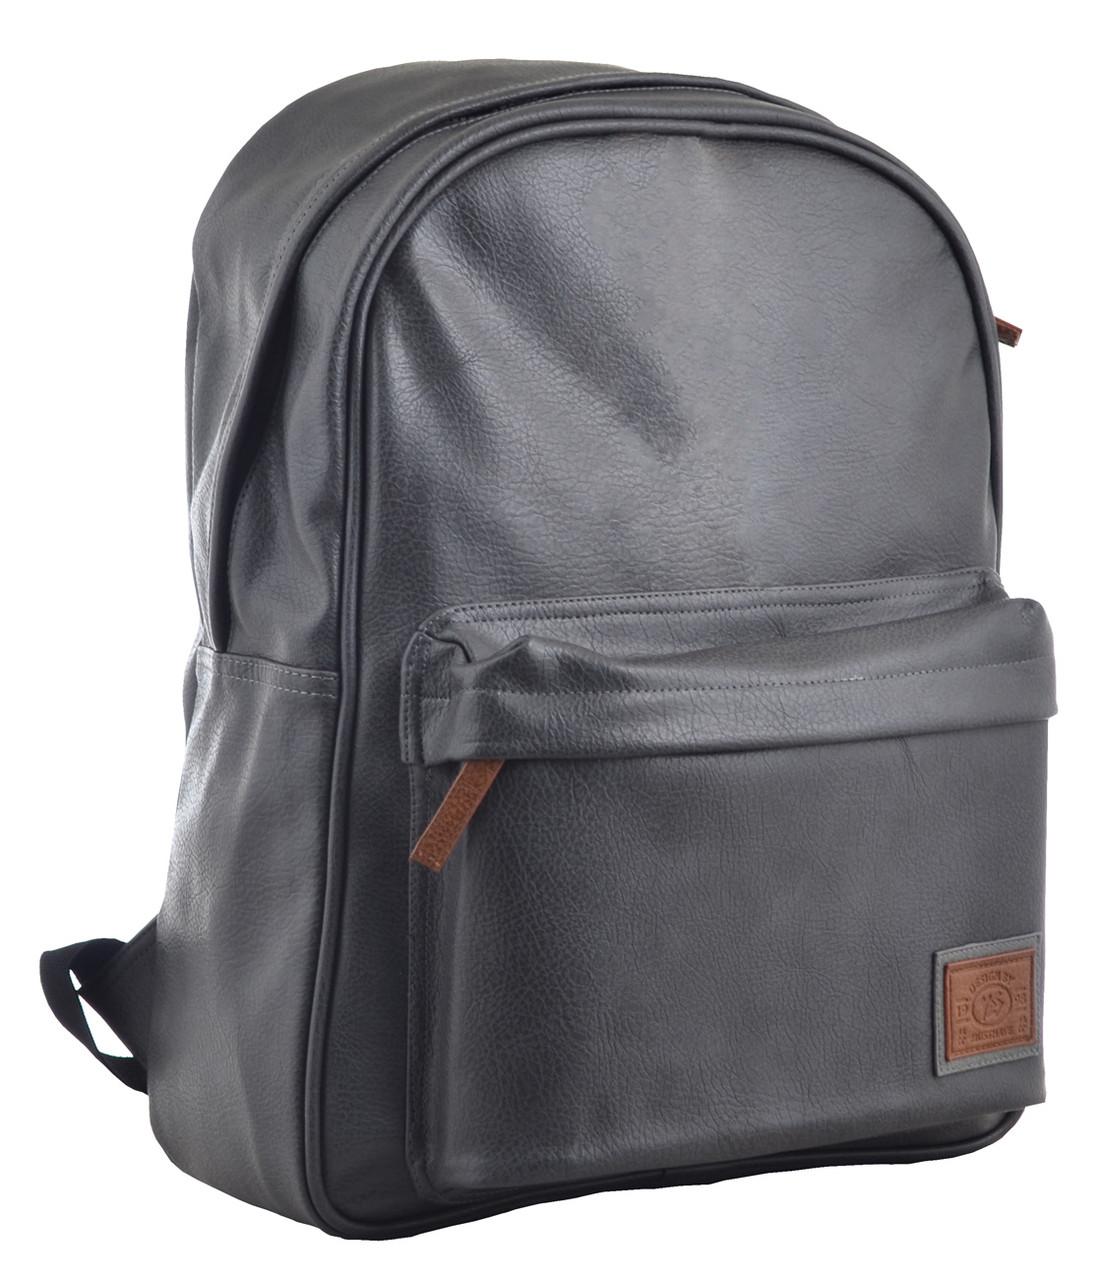 Рюкзак городской YES ST-16 Infinity mist grey, 42*31*13 код: 555048